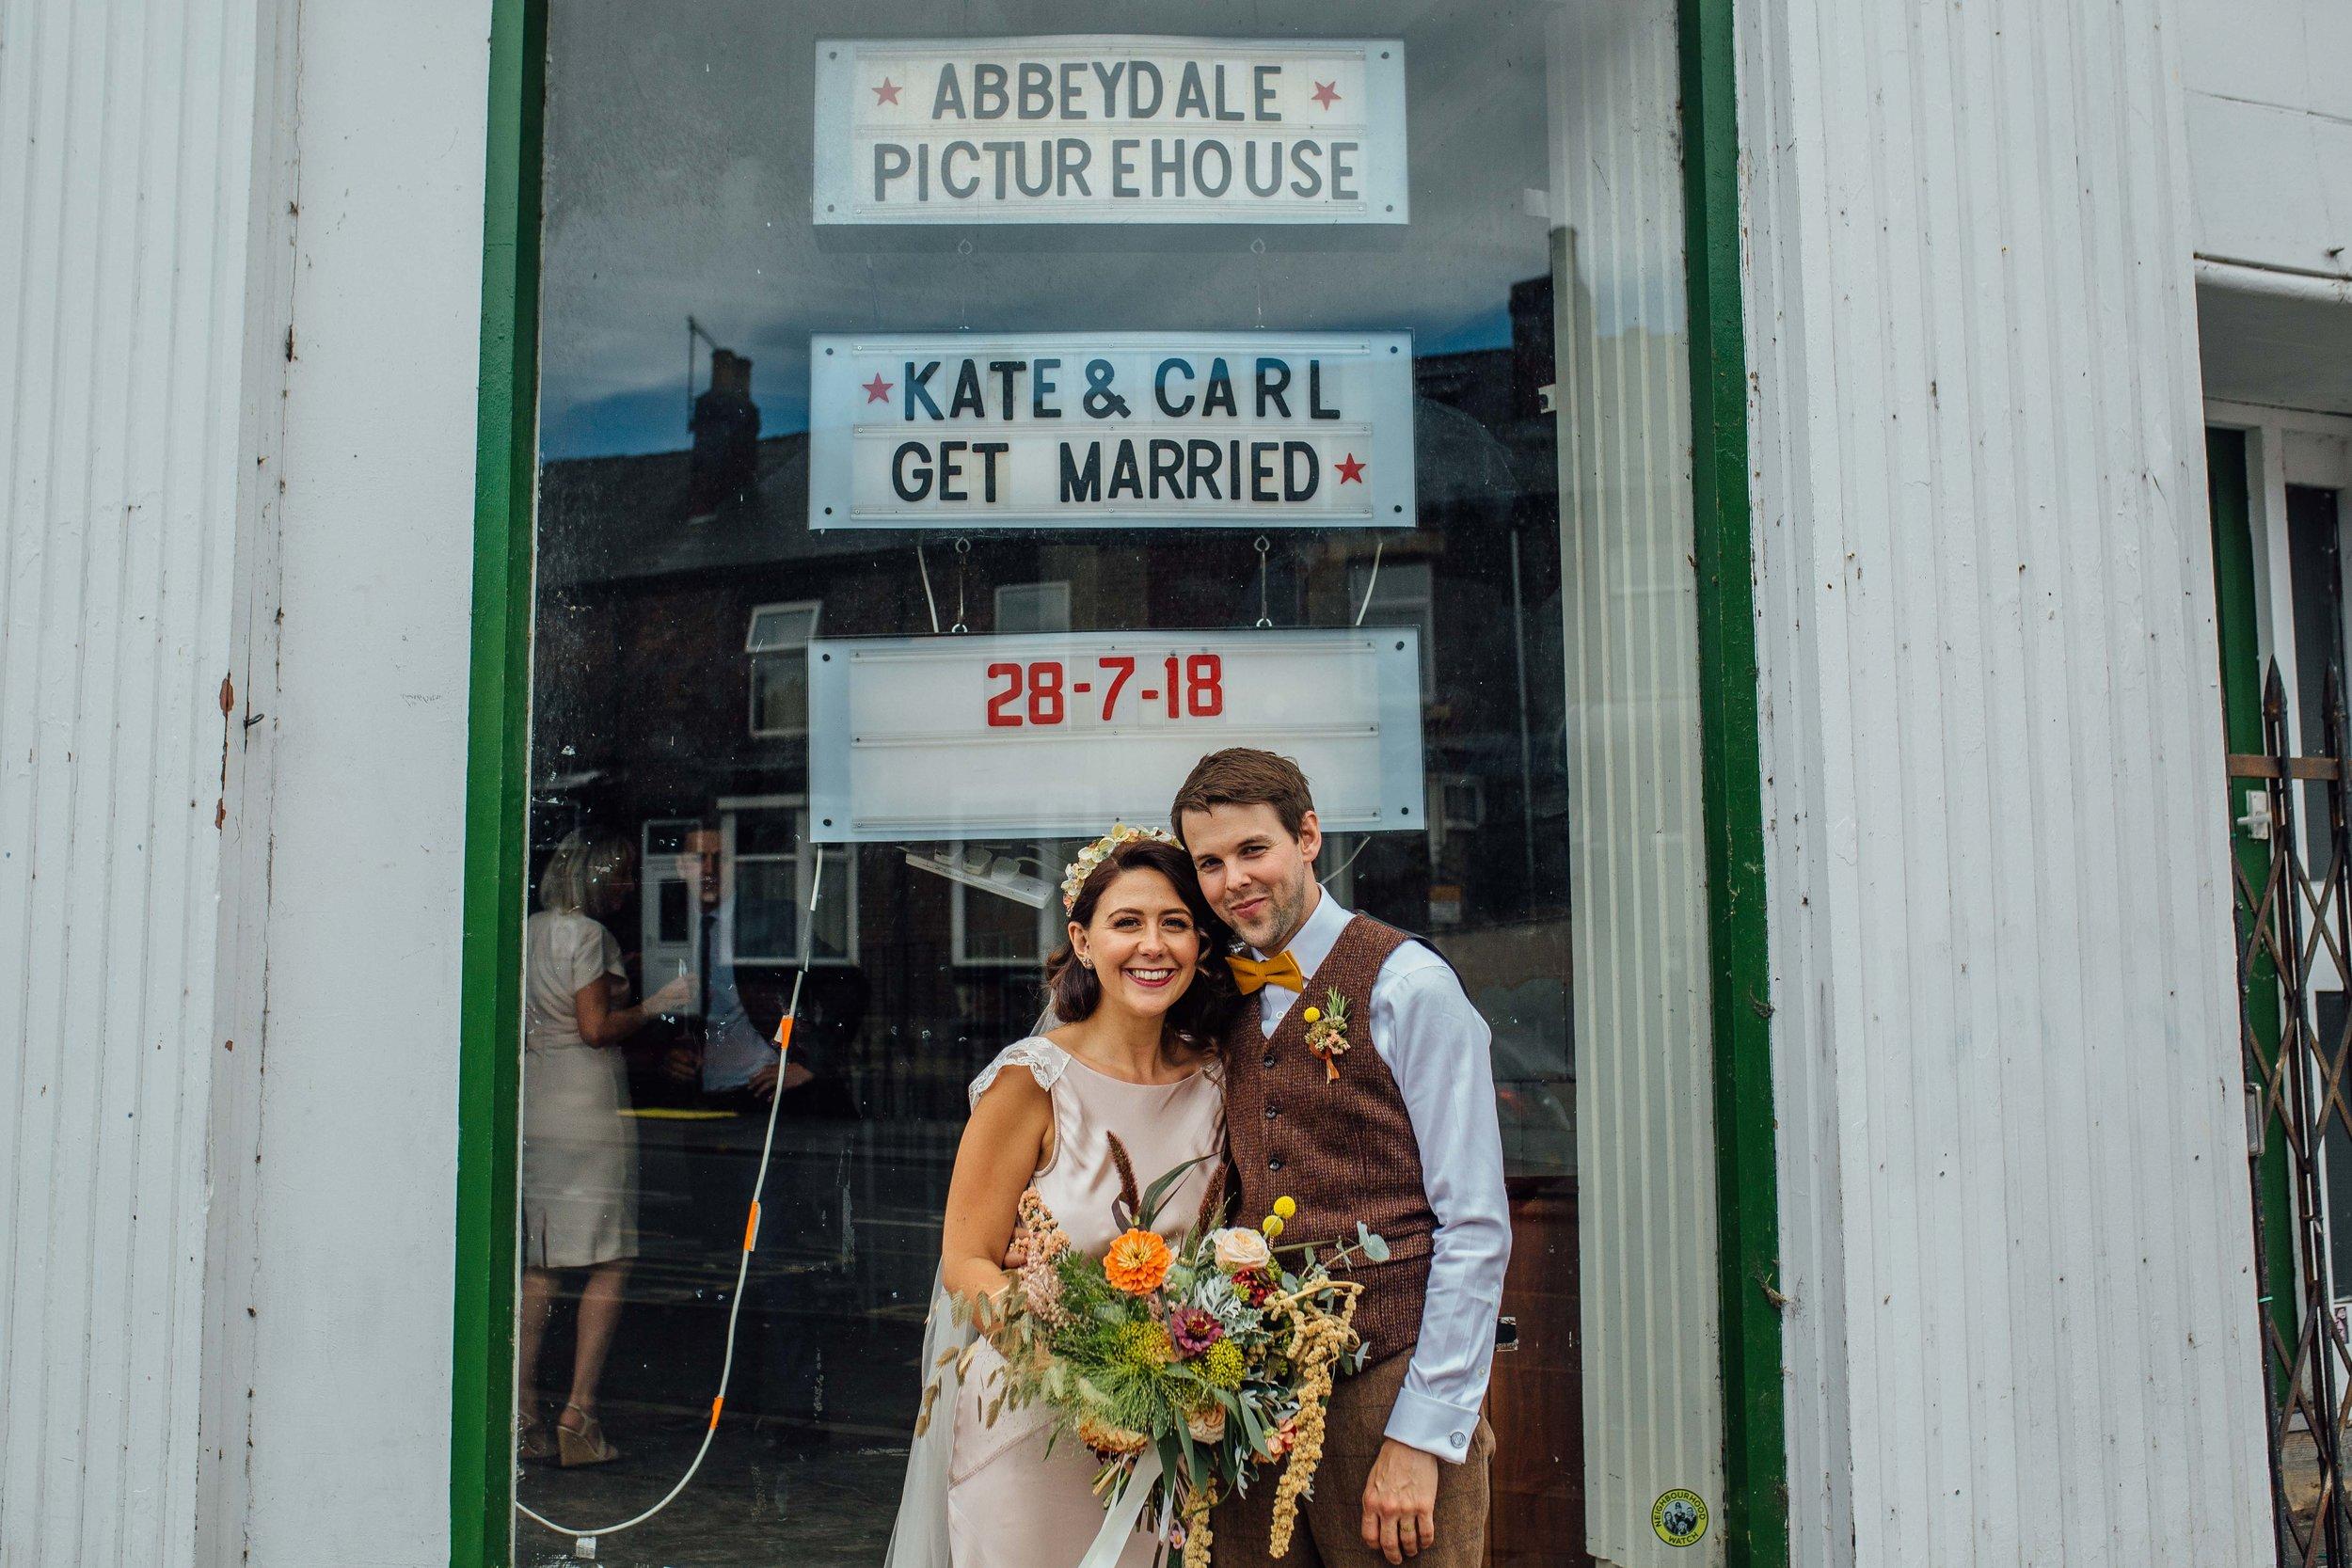 Katy-Bespoke-Veil-Sheffield-Wedding-Wes-Anderson-Susanna-Greening-Derbyshire-18